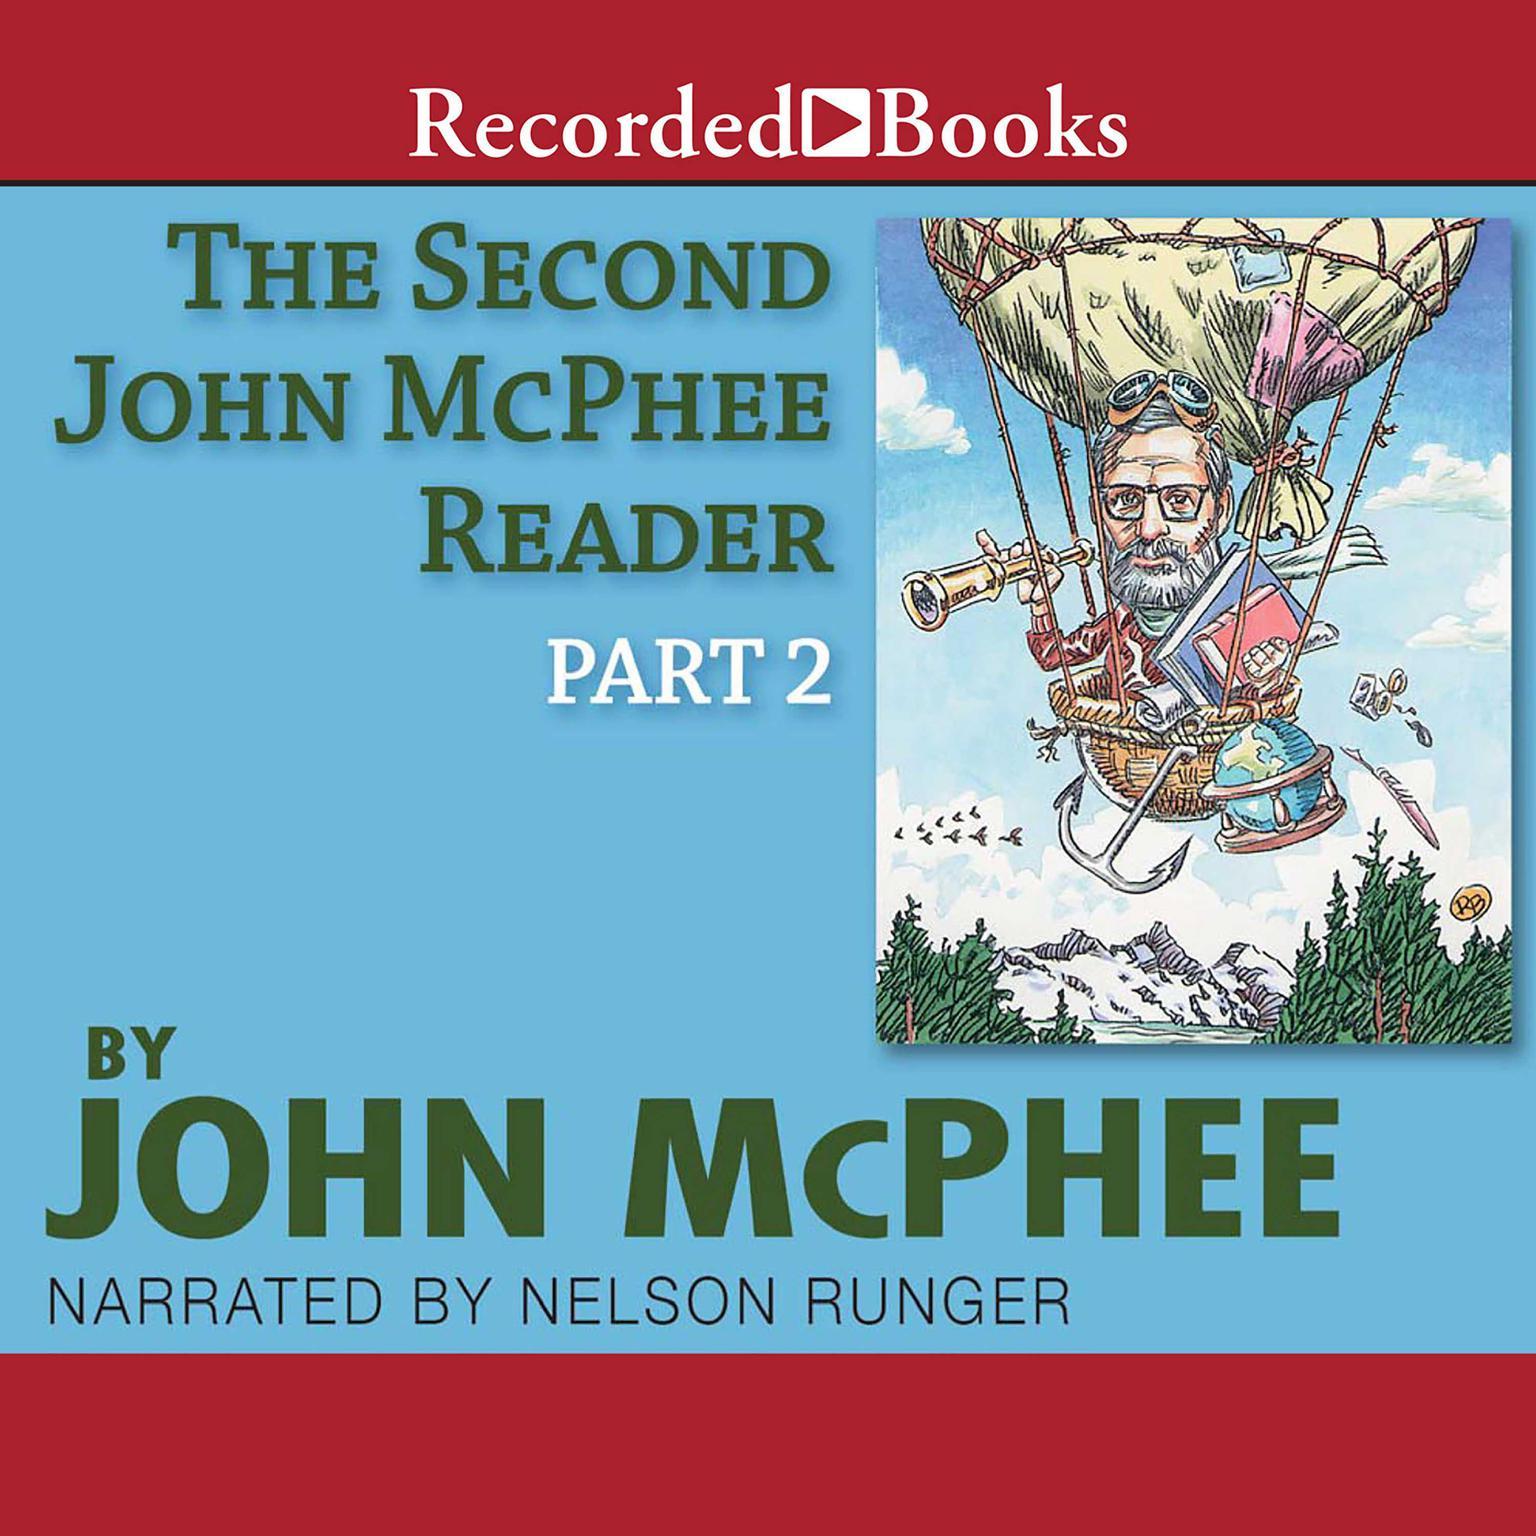 The Second John McPhee Reader, Part Two Audiobook, by John McPhee